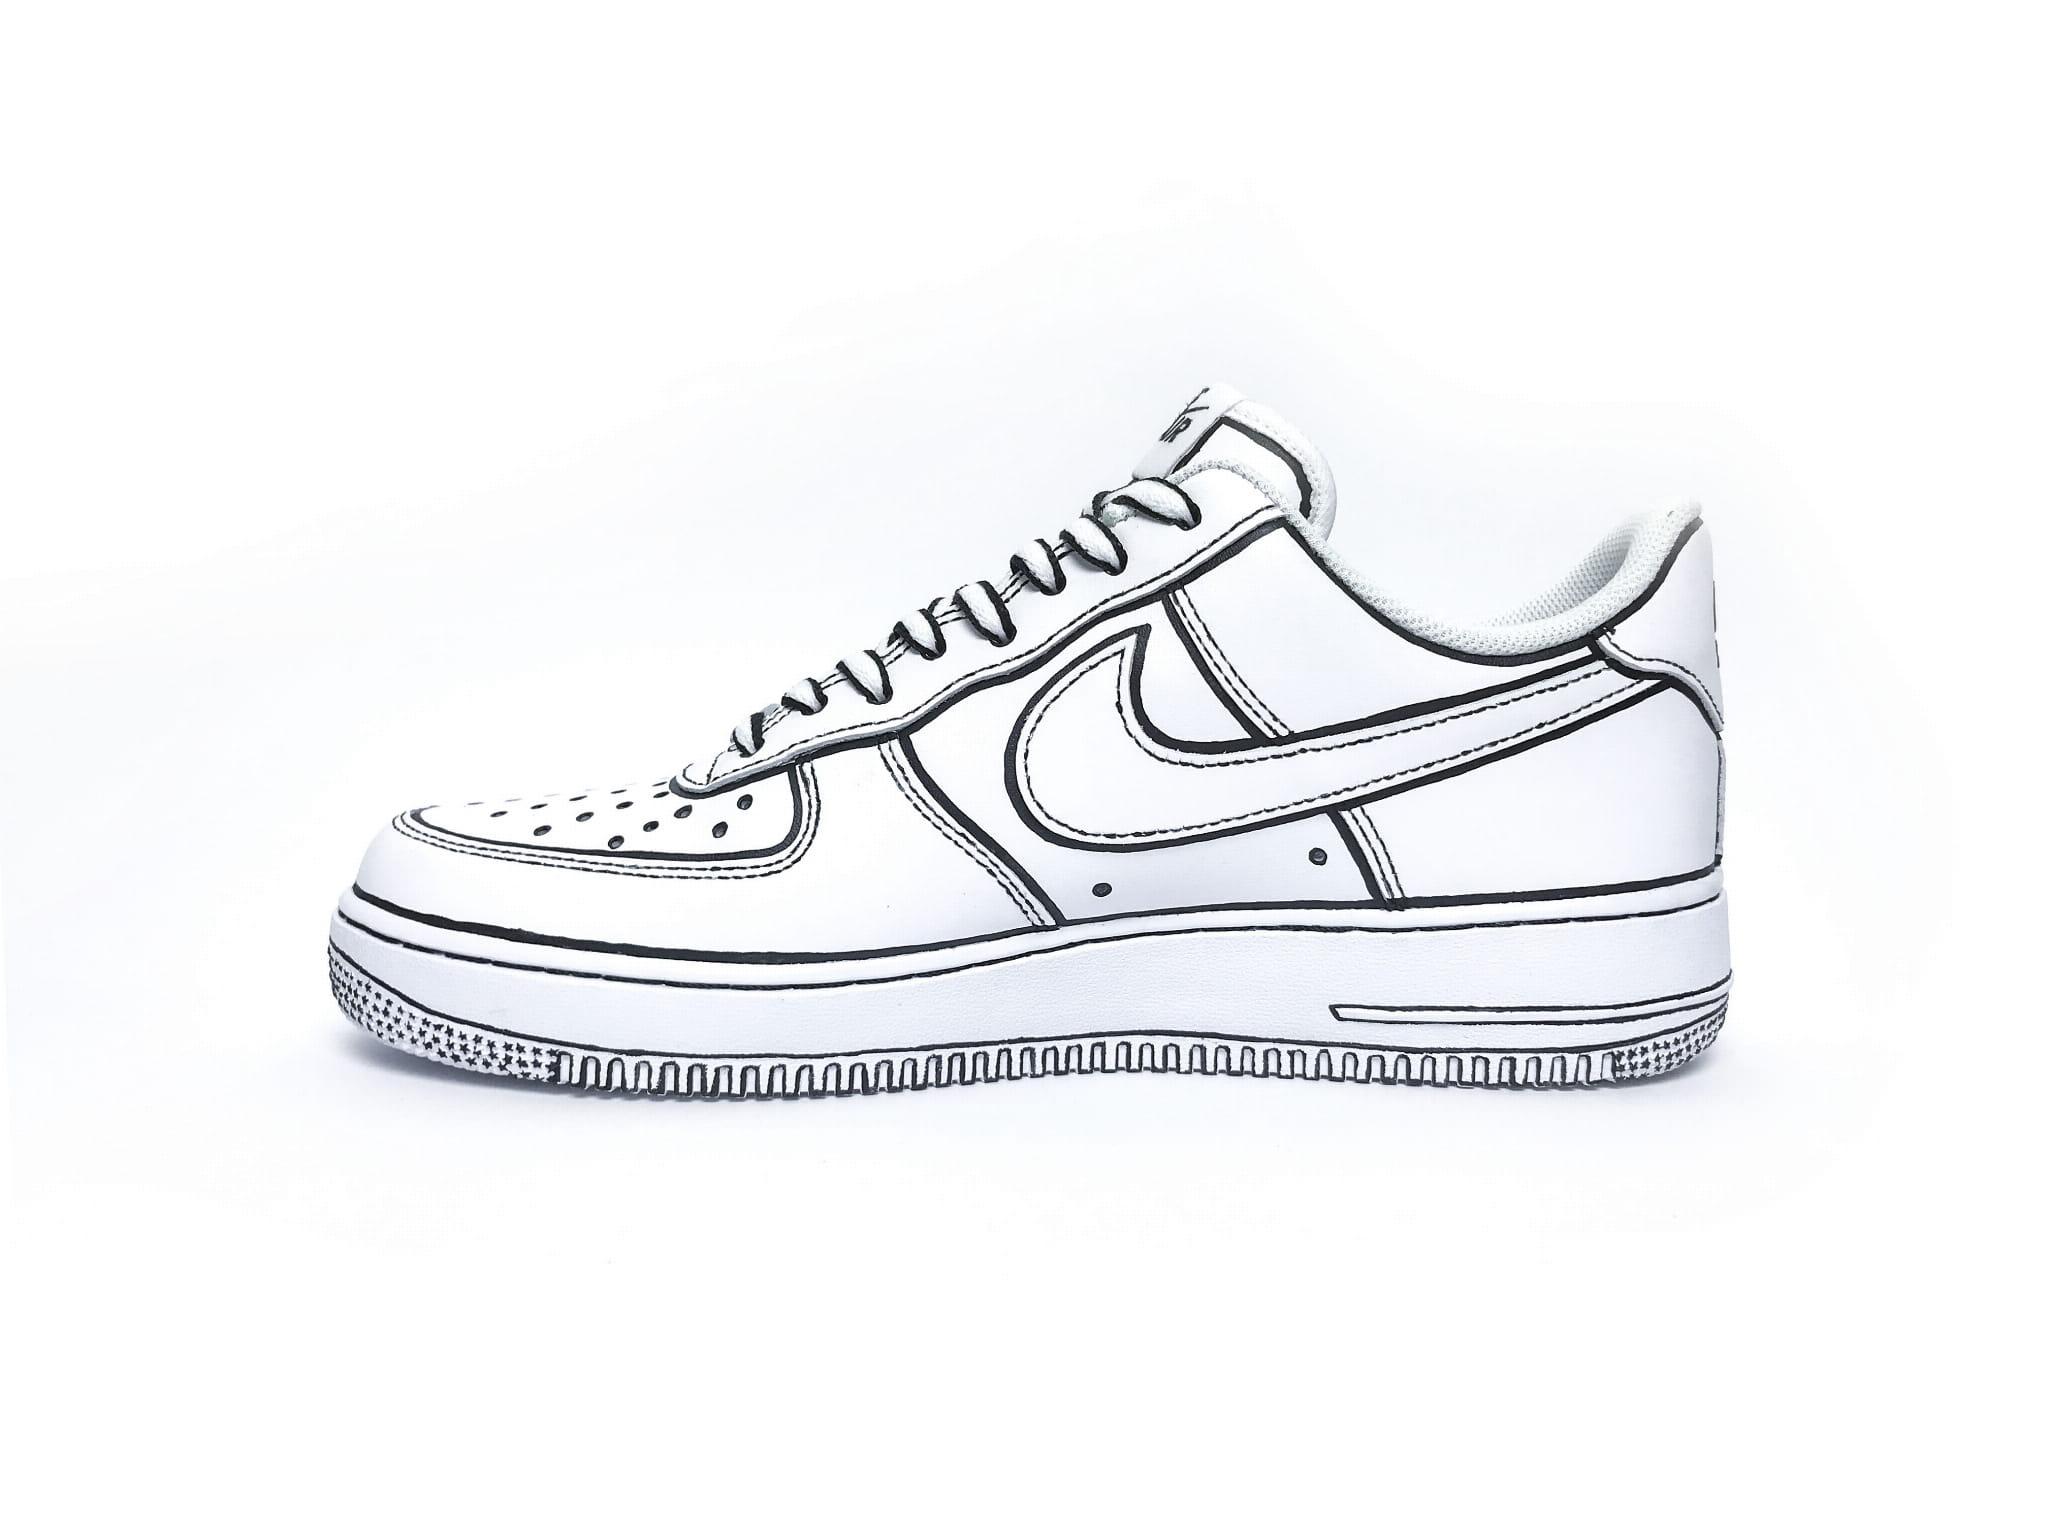 Buty Kazimierz Odnowiciel   Nike, Nike air, Nike air force